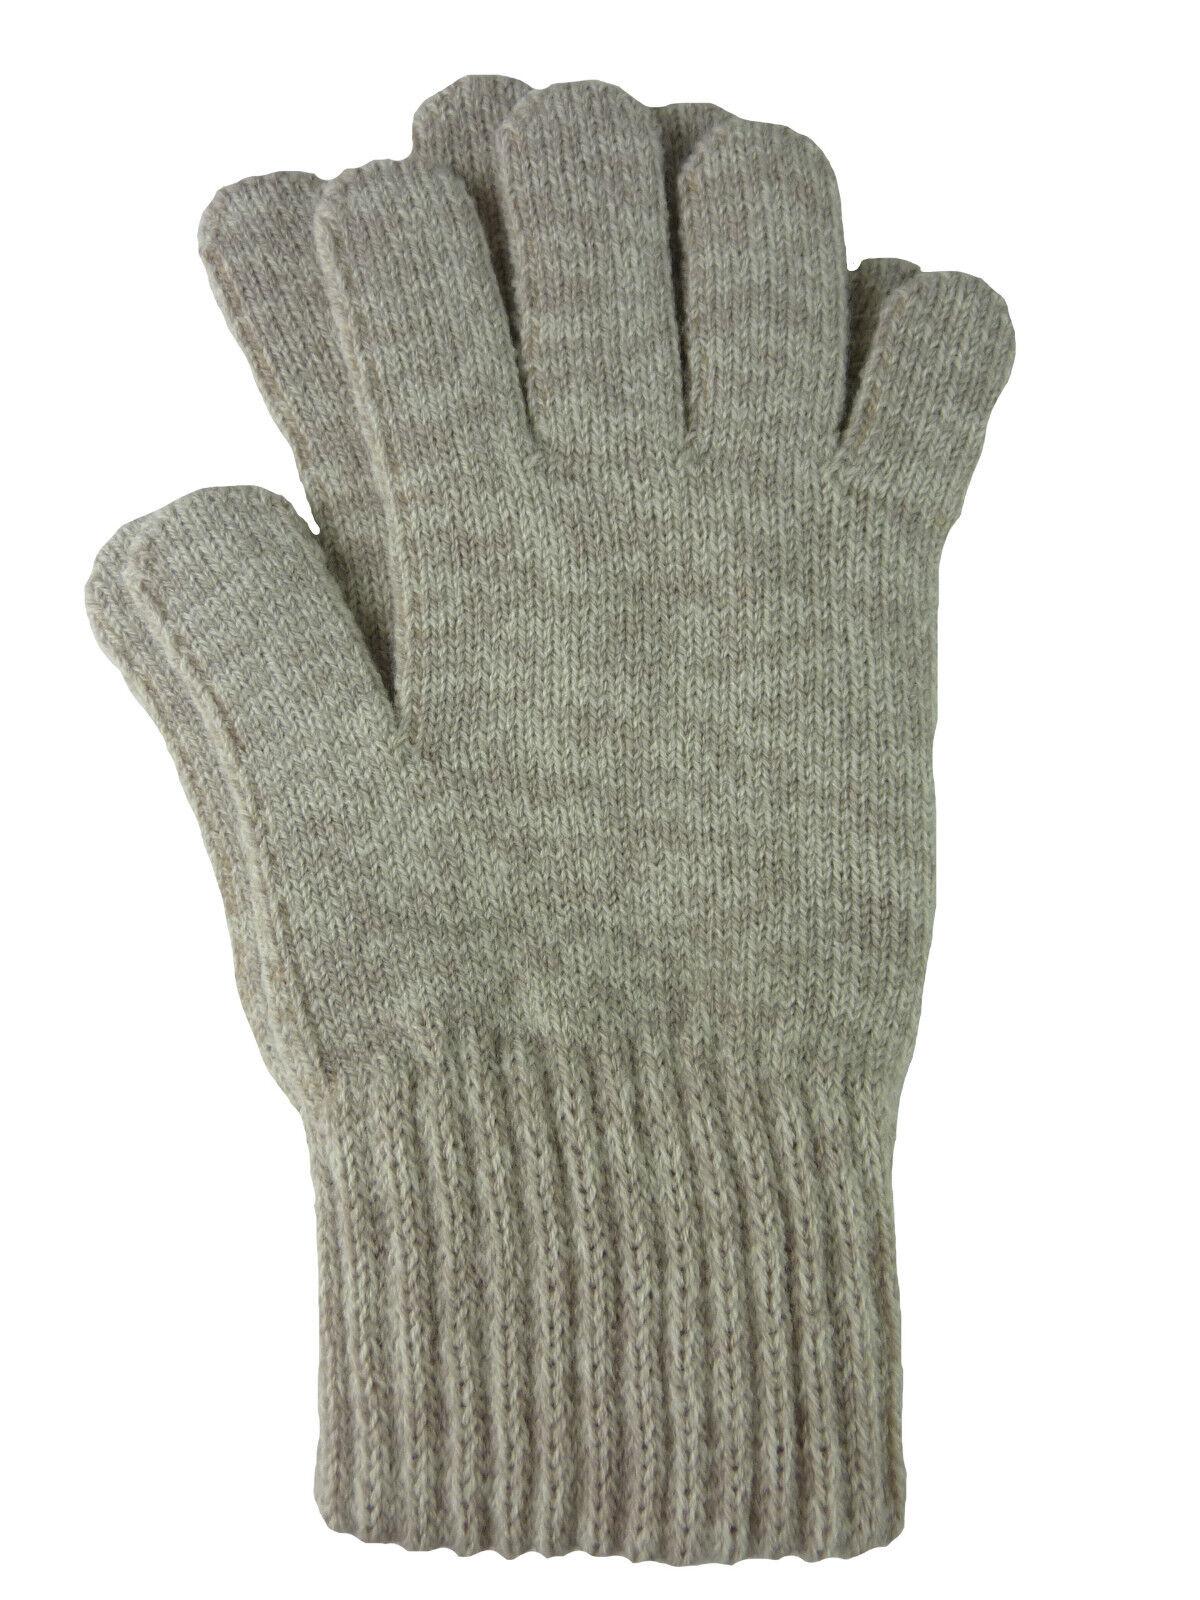 370162bab9f831 TEA 3 teiliges Damen Winterset Schal Mütze Handschuhe Geschenkidee ...